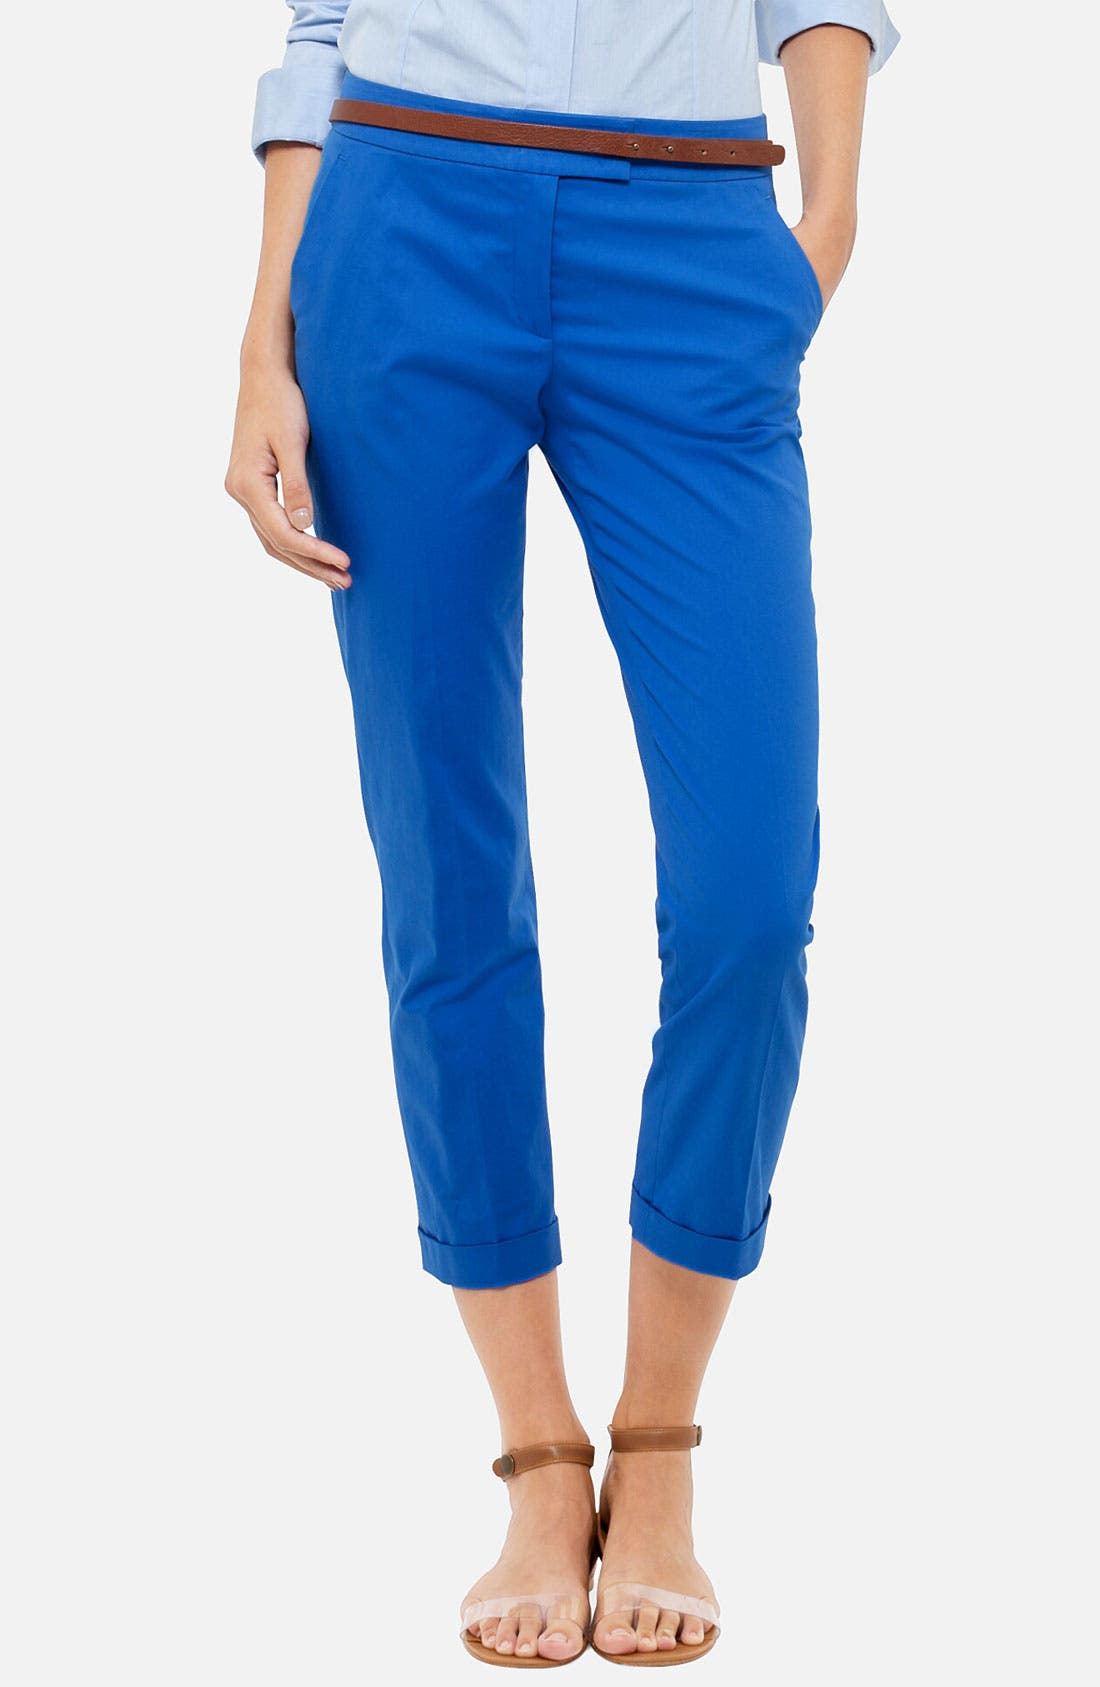 Alternate Image 1 Selected - Akris punto 'Frankie' Stretch Cotton Crop Pants